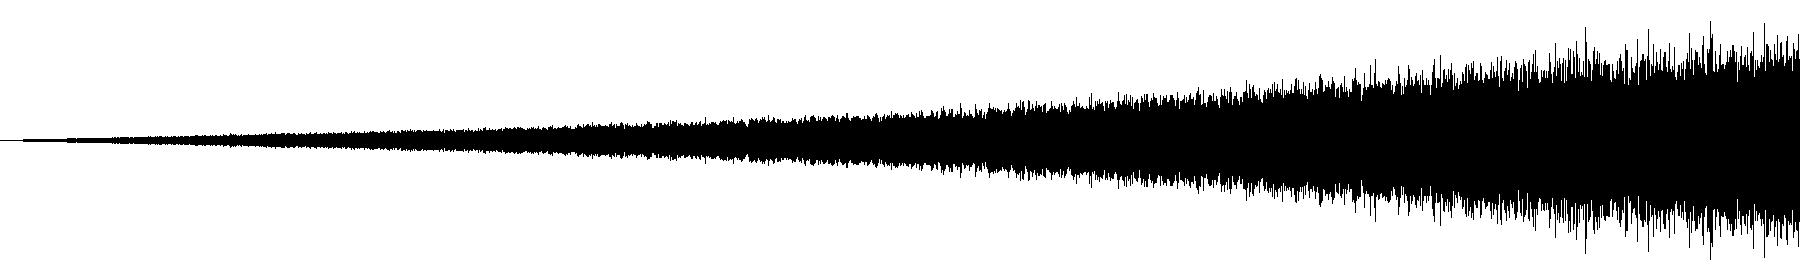 vuf1 128bpm cult orch rev 8bars d